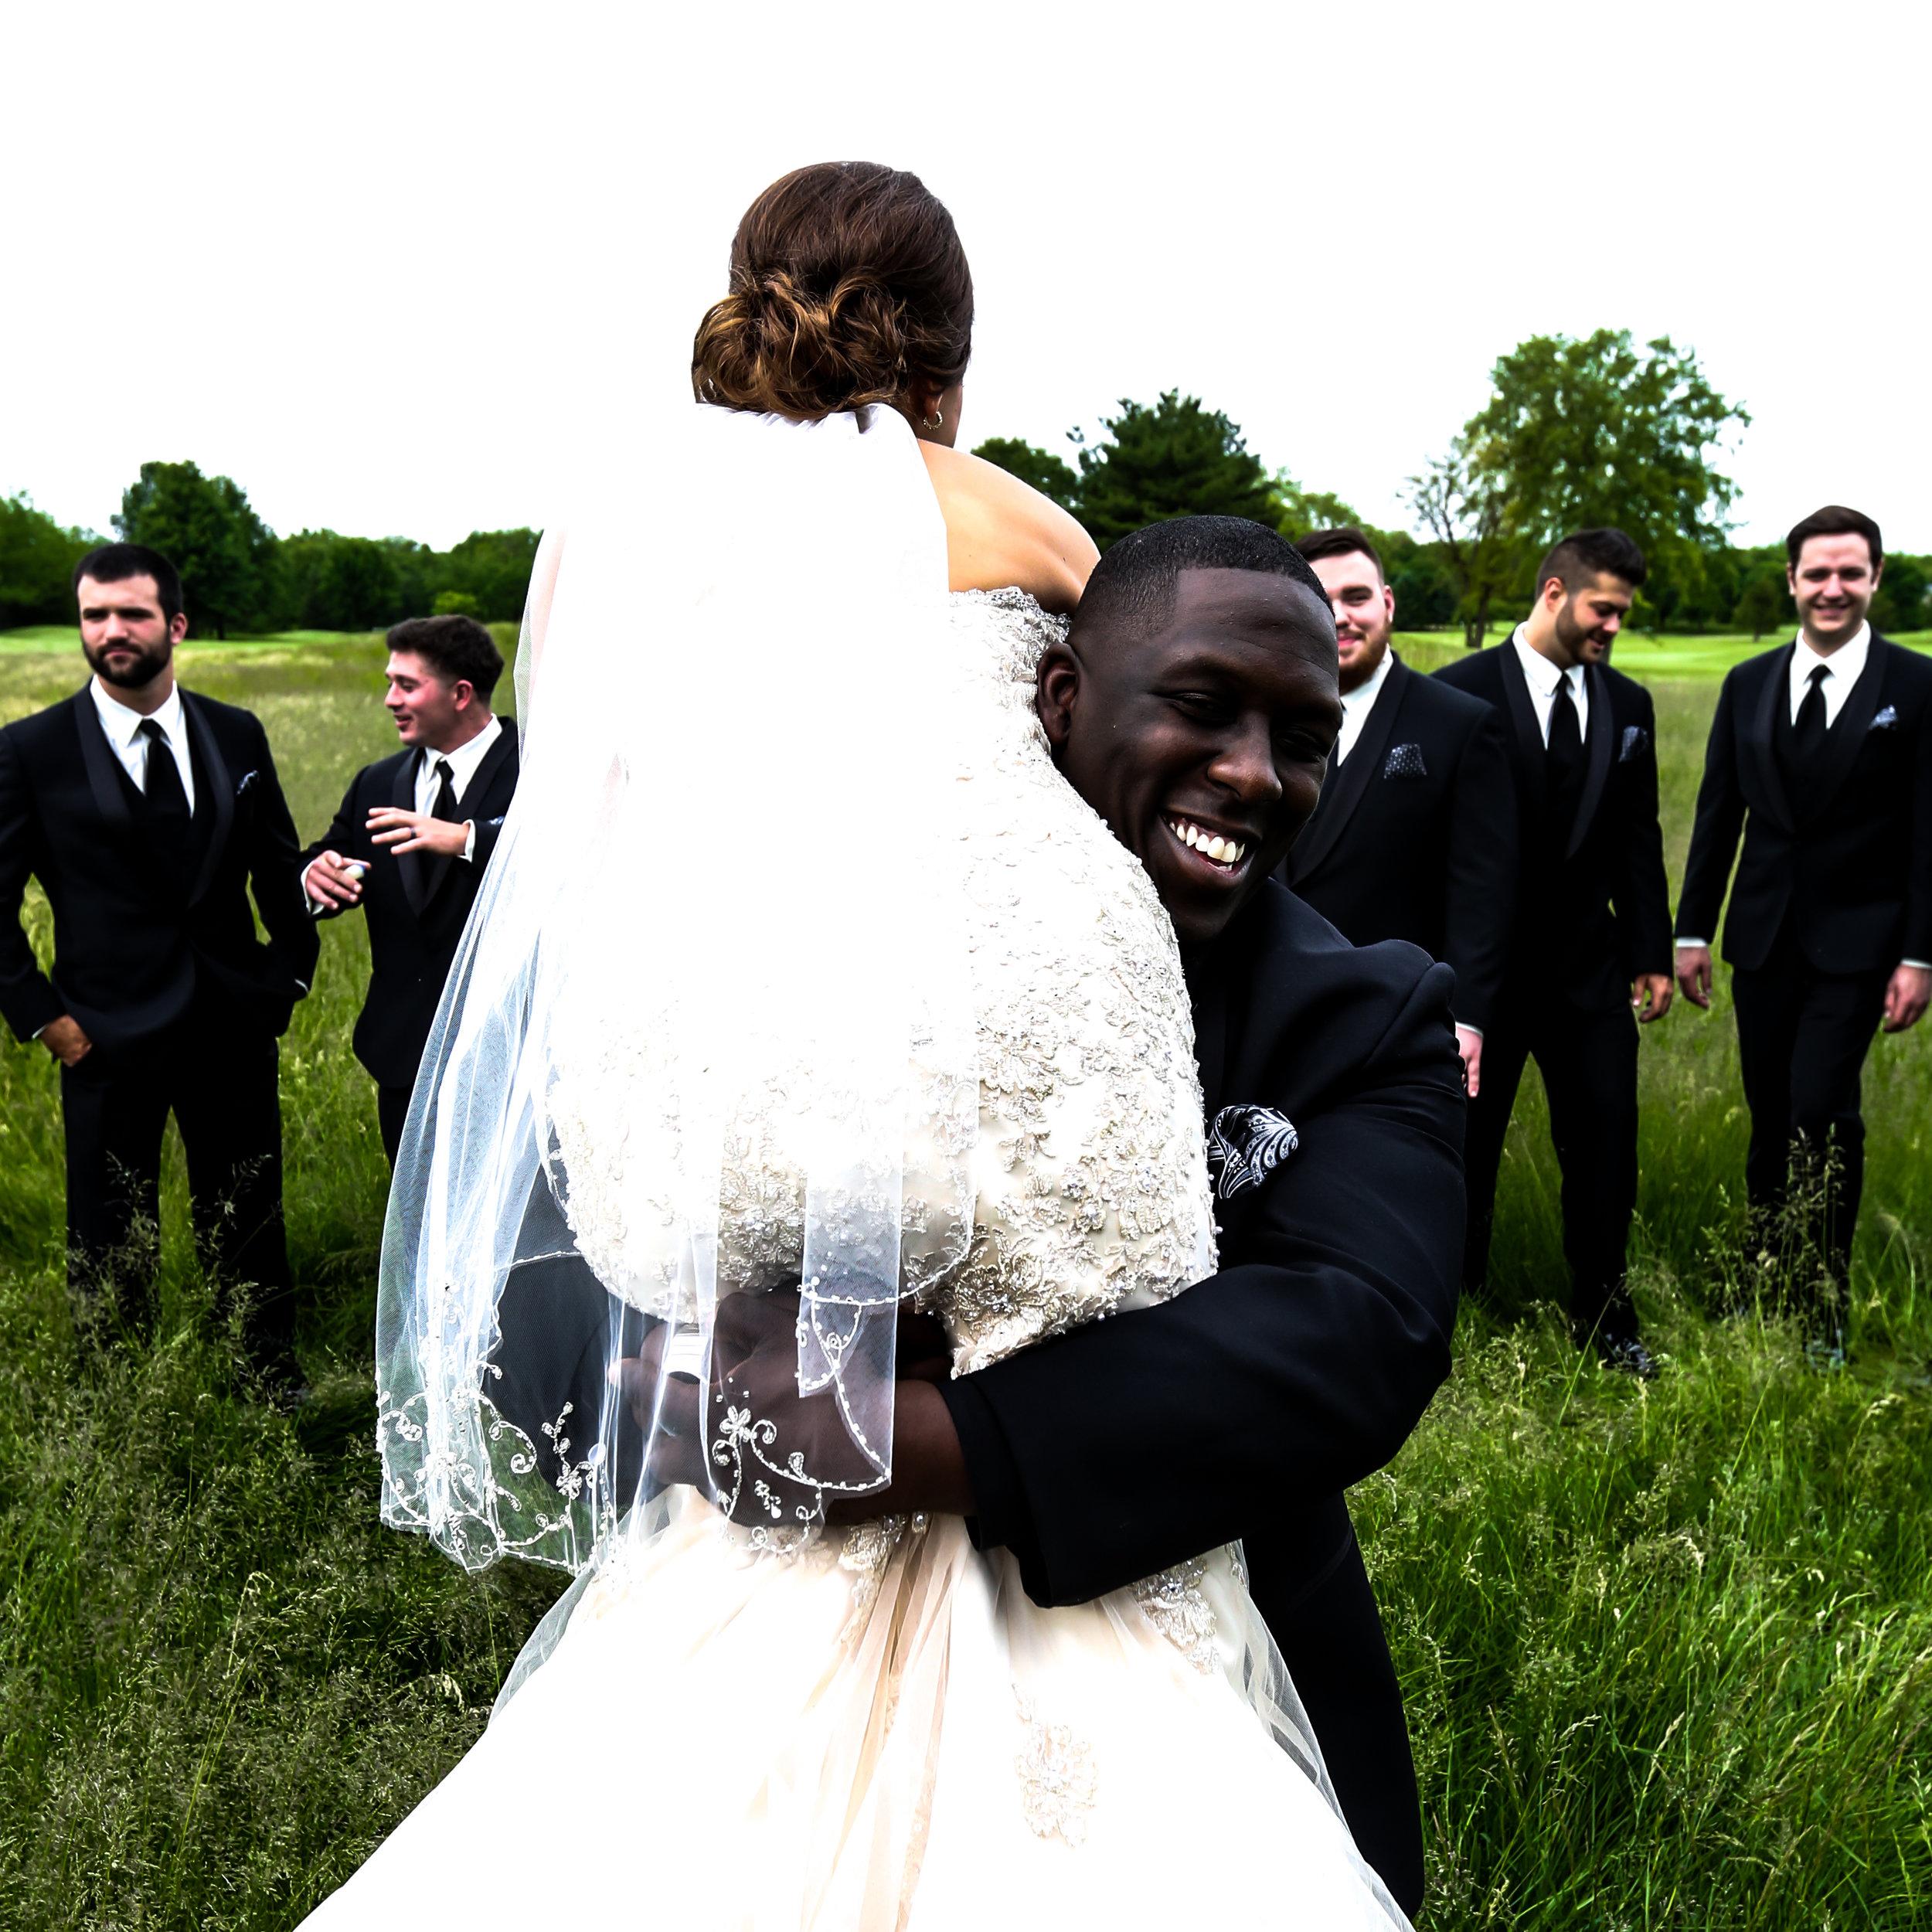 WeddingWebsite-8.jpg